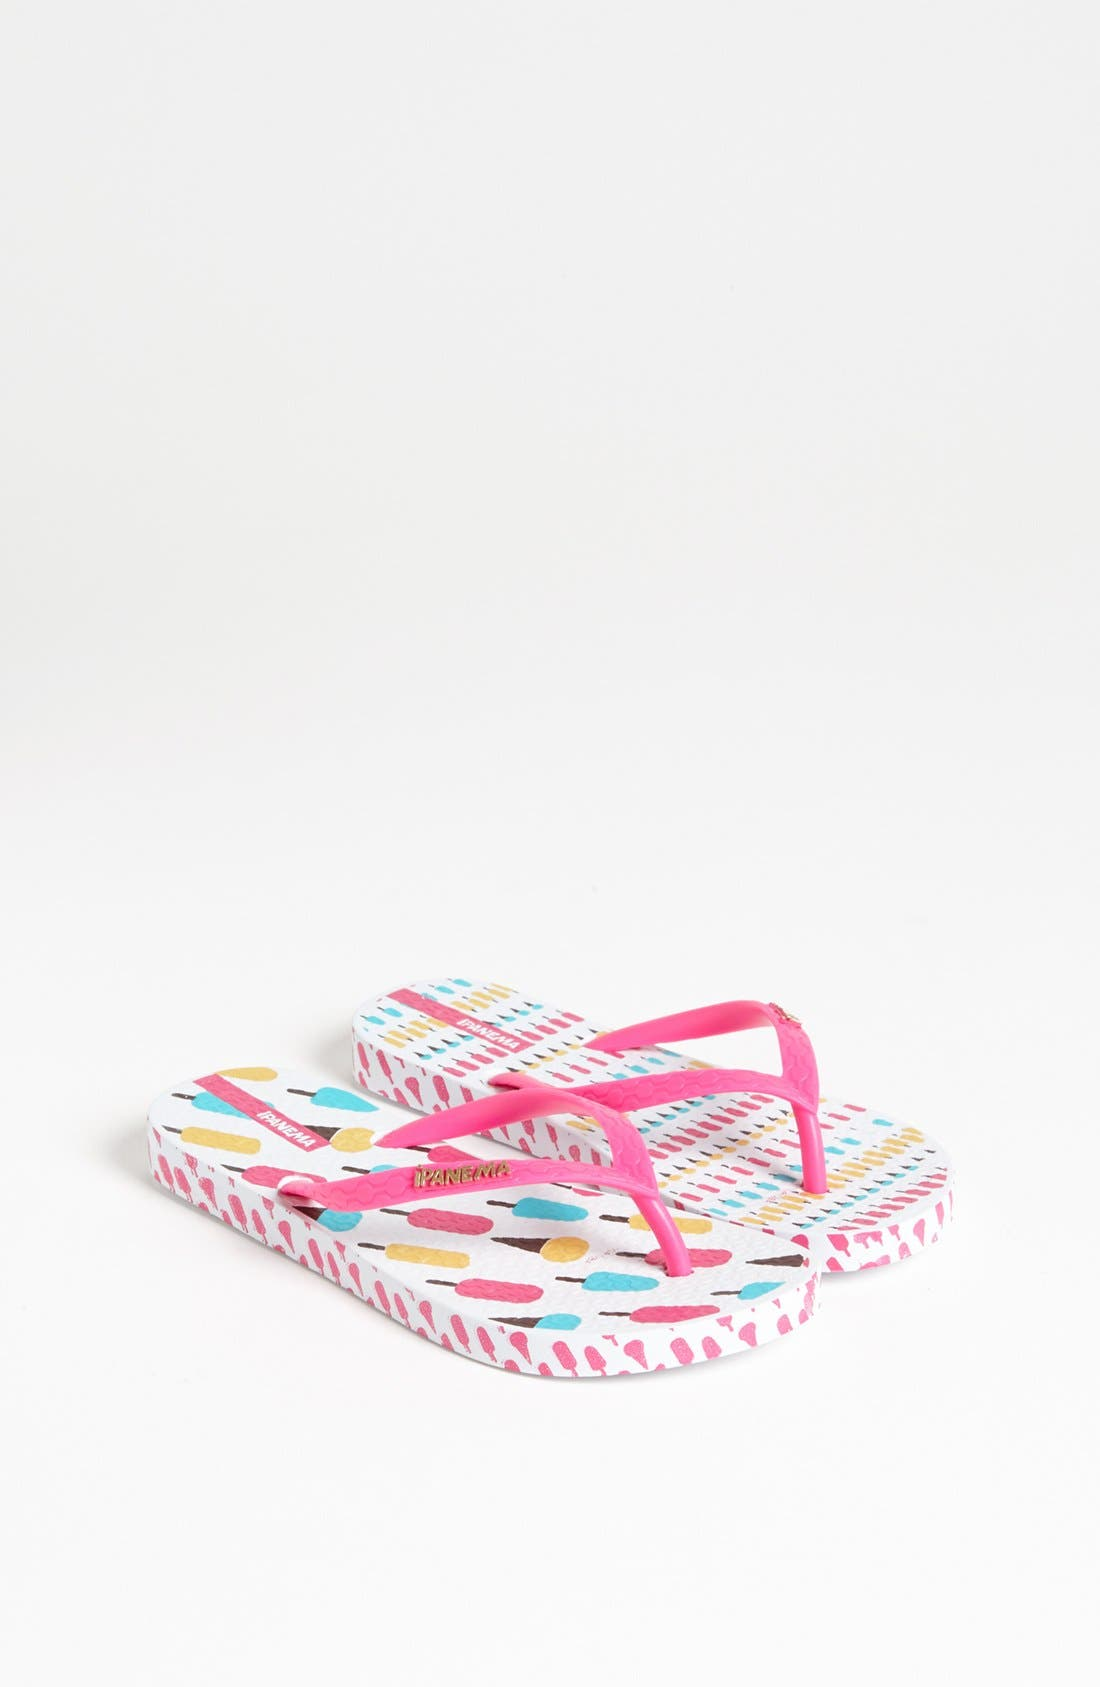 Main Image - Ipanema 'Unique' Flip Flop (Toddler, Little Kid & Big Kid)